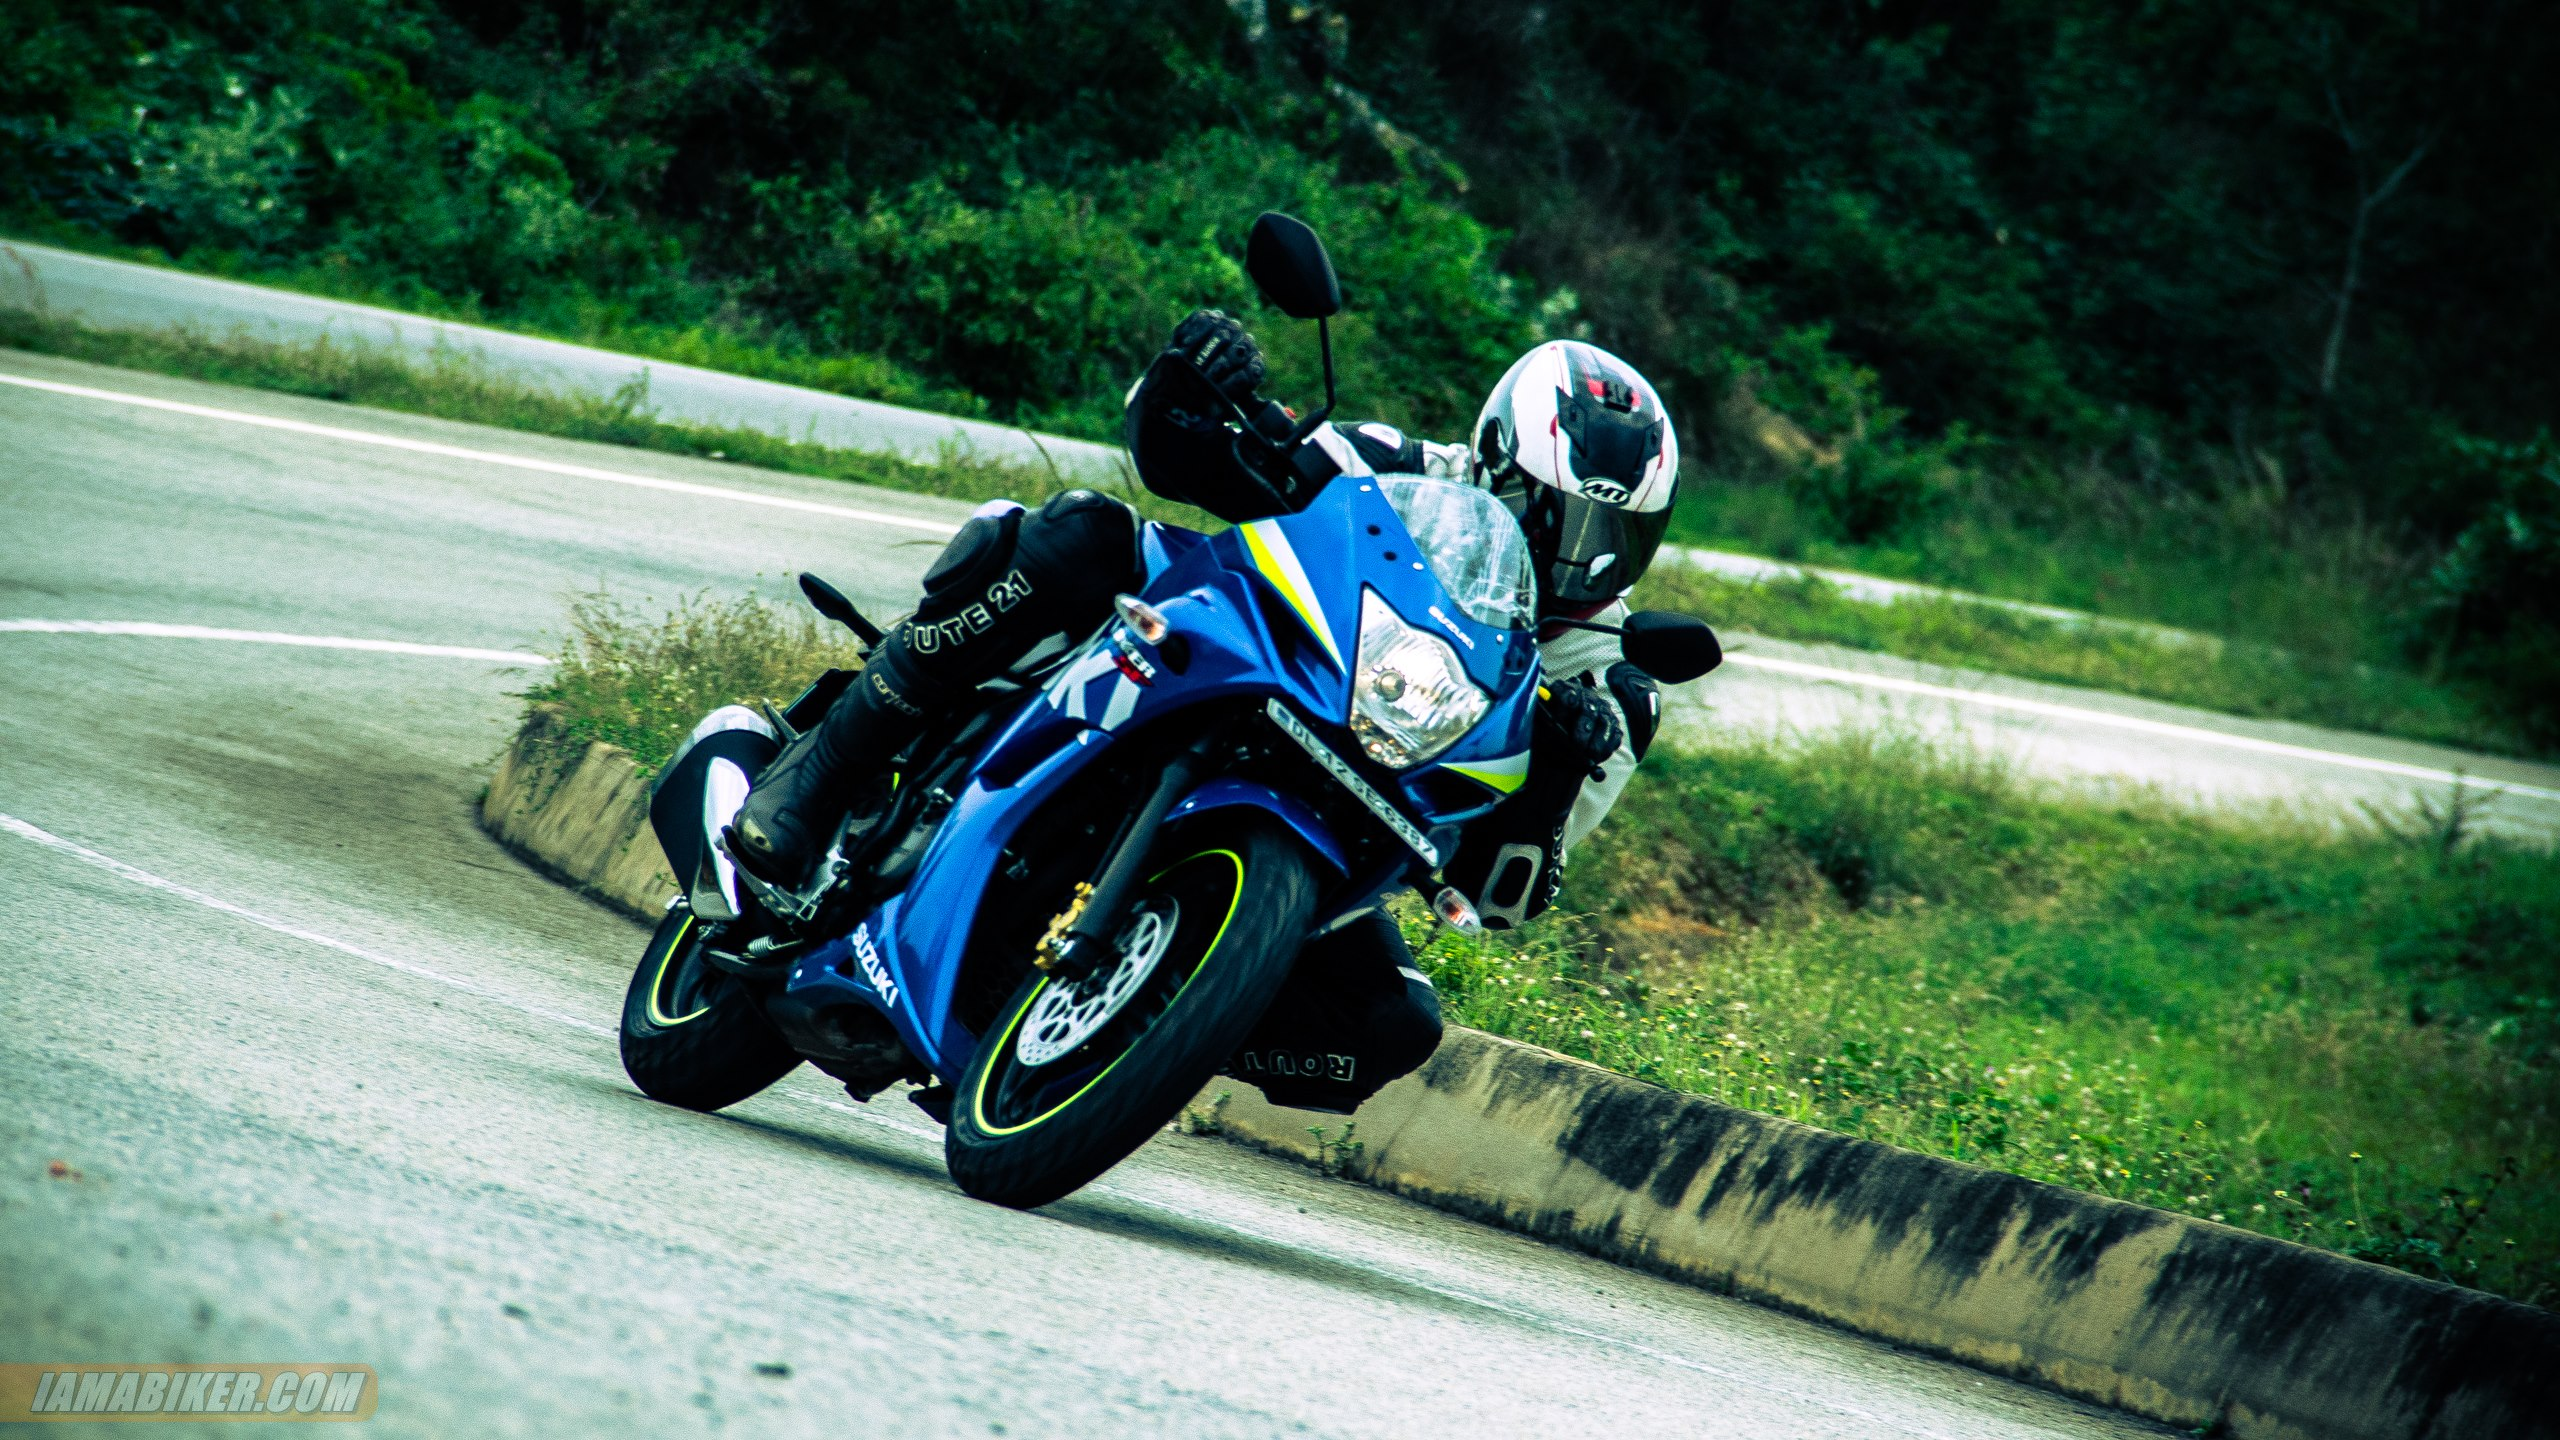 Suzuki Gixxer SF review handling and braking